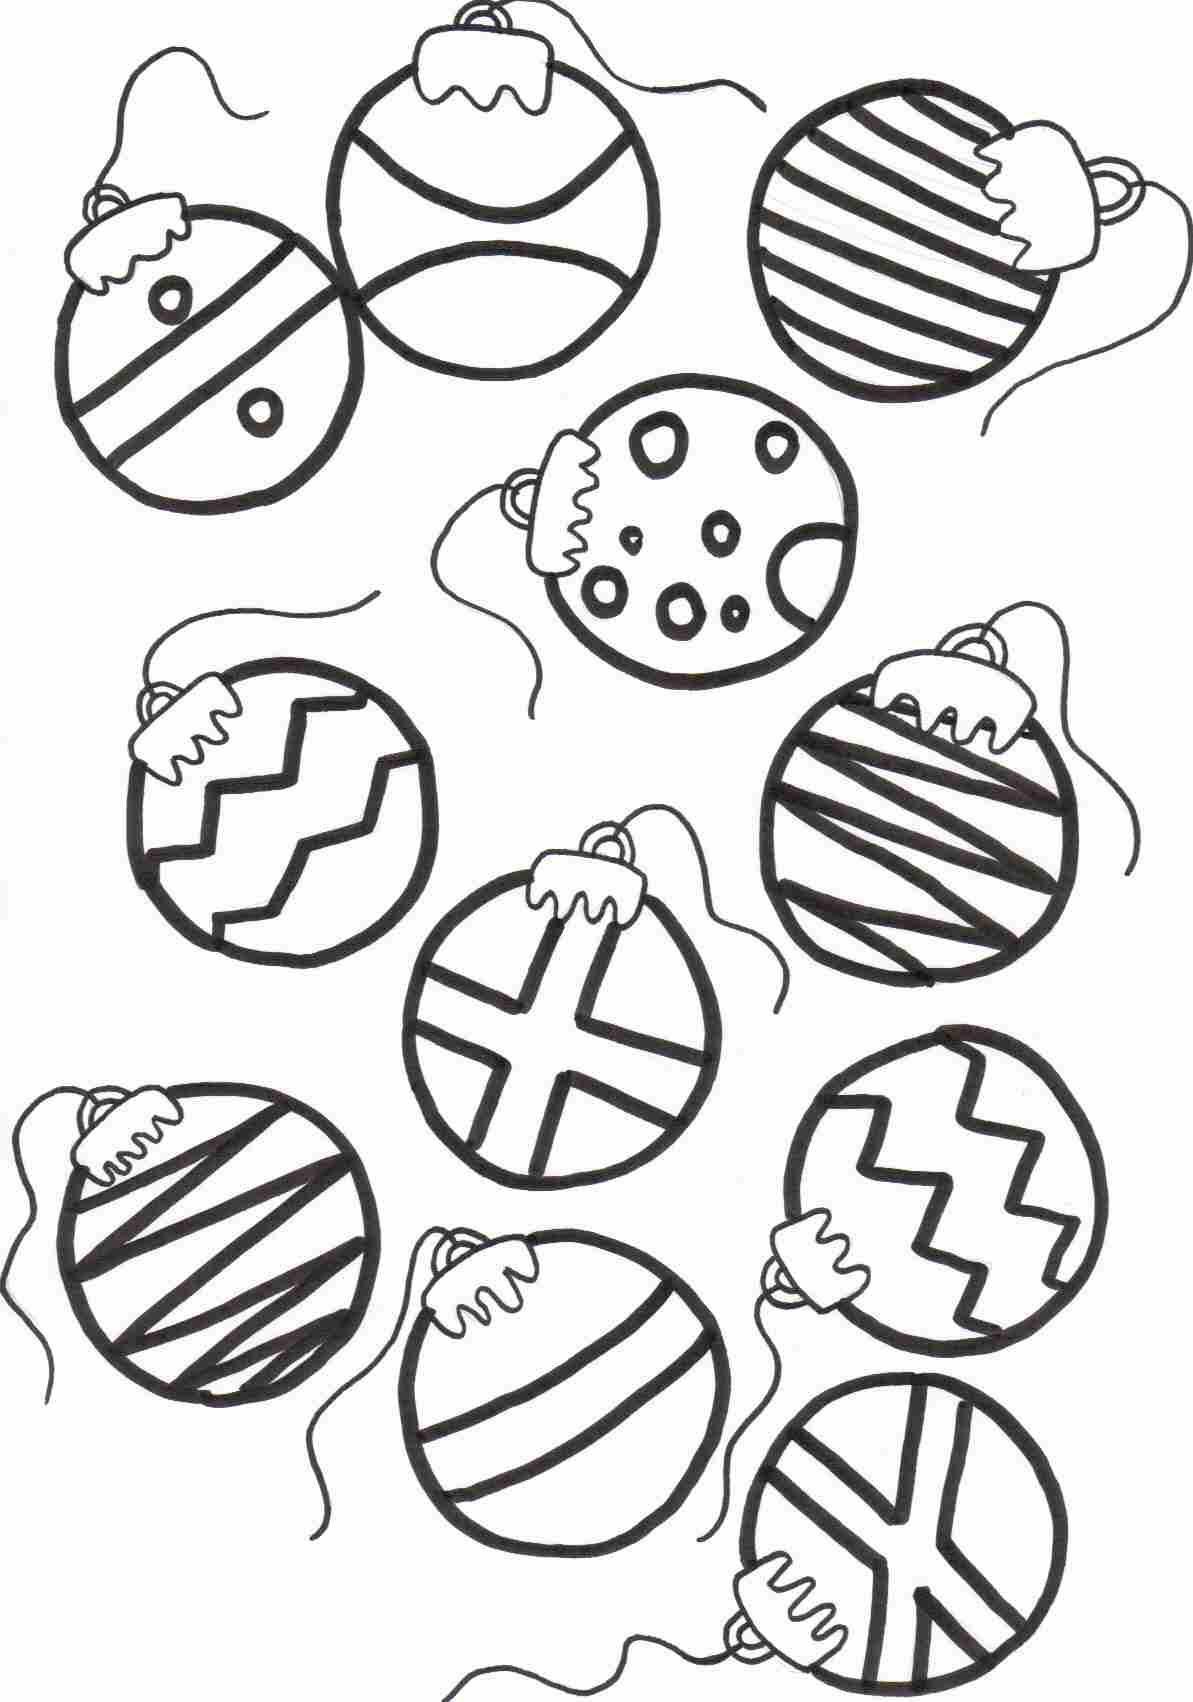 Pindai Davis On E L E M E N T A R Y | Pinterest | Christmas Tree - Free Printable Christmas Tree Ornaments To Color